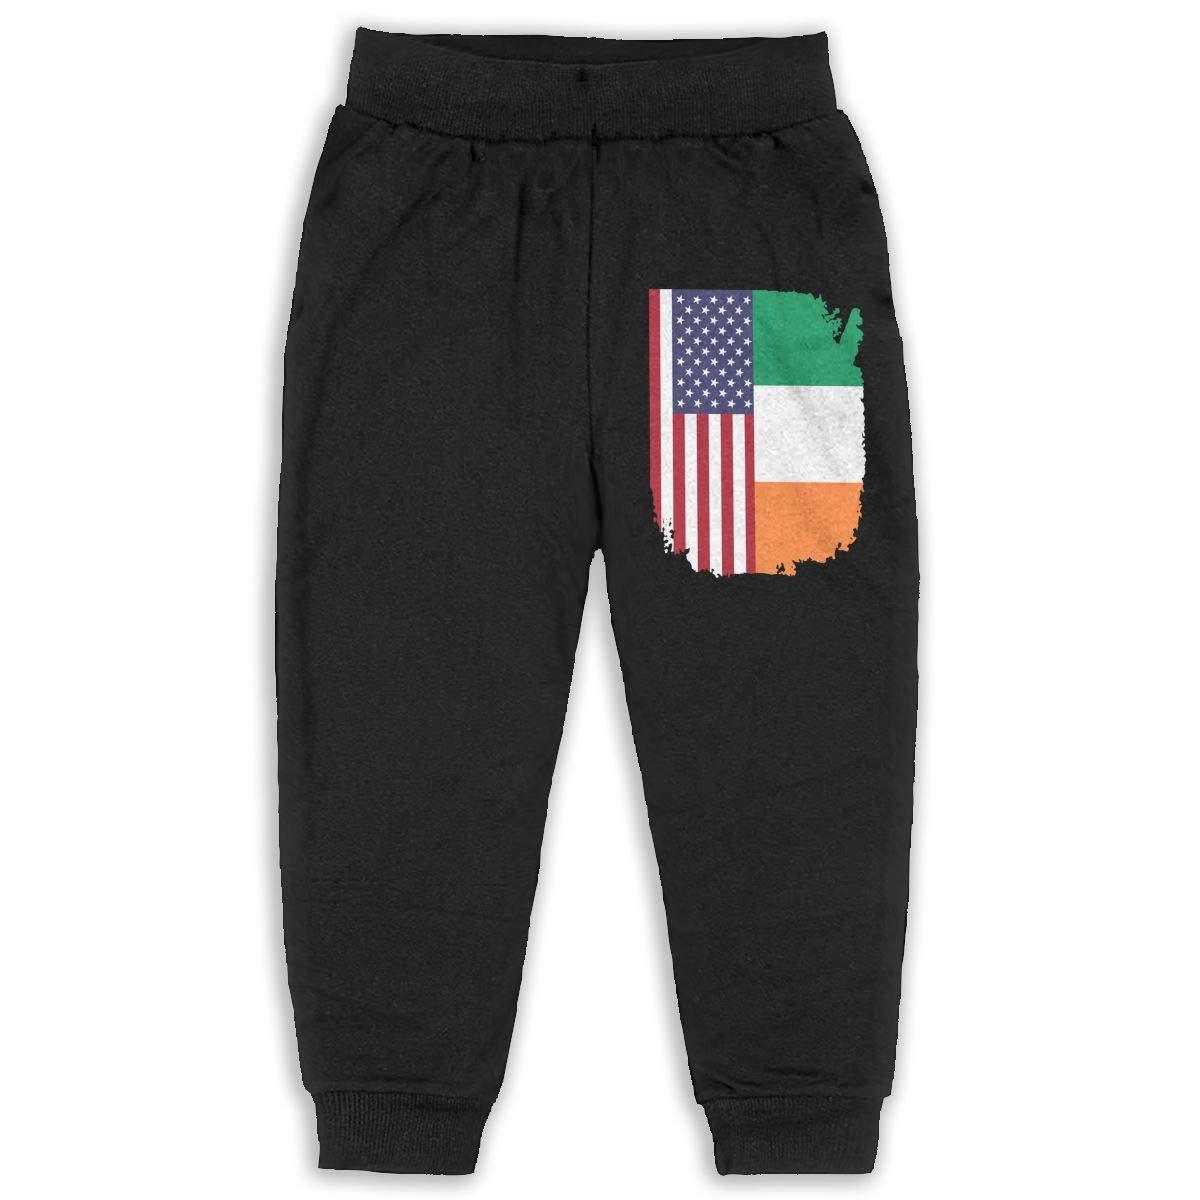 Udyi/&Jln-97 American Irish Flag Unisex Kid Toddler Pants Soft Cozy Boys /& Girls Jogger Play Pant